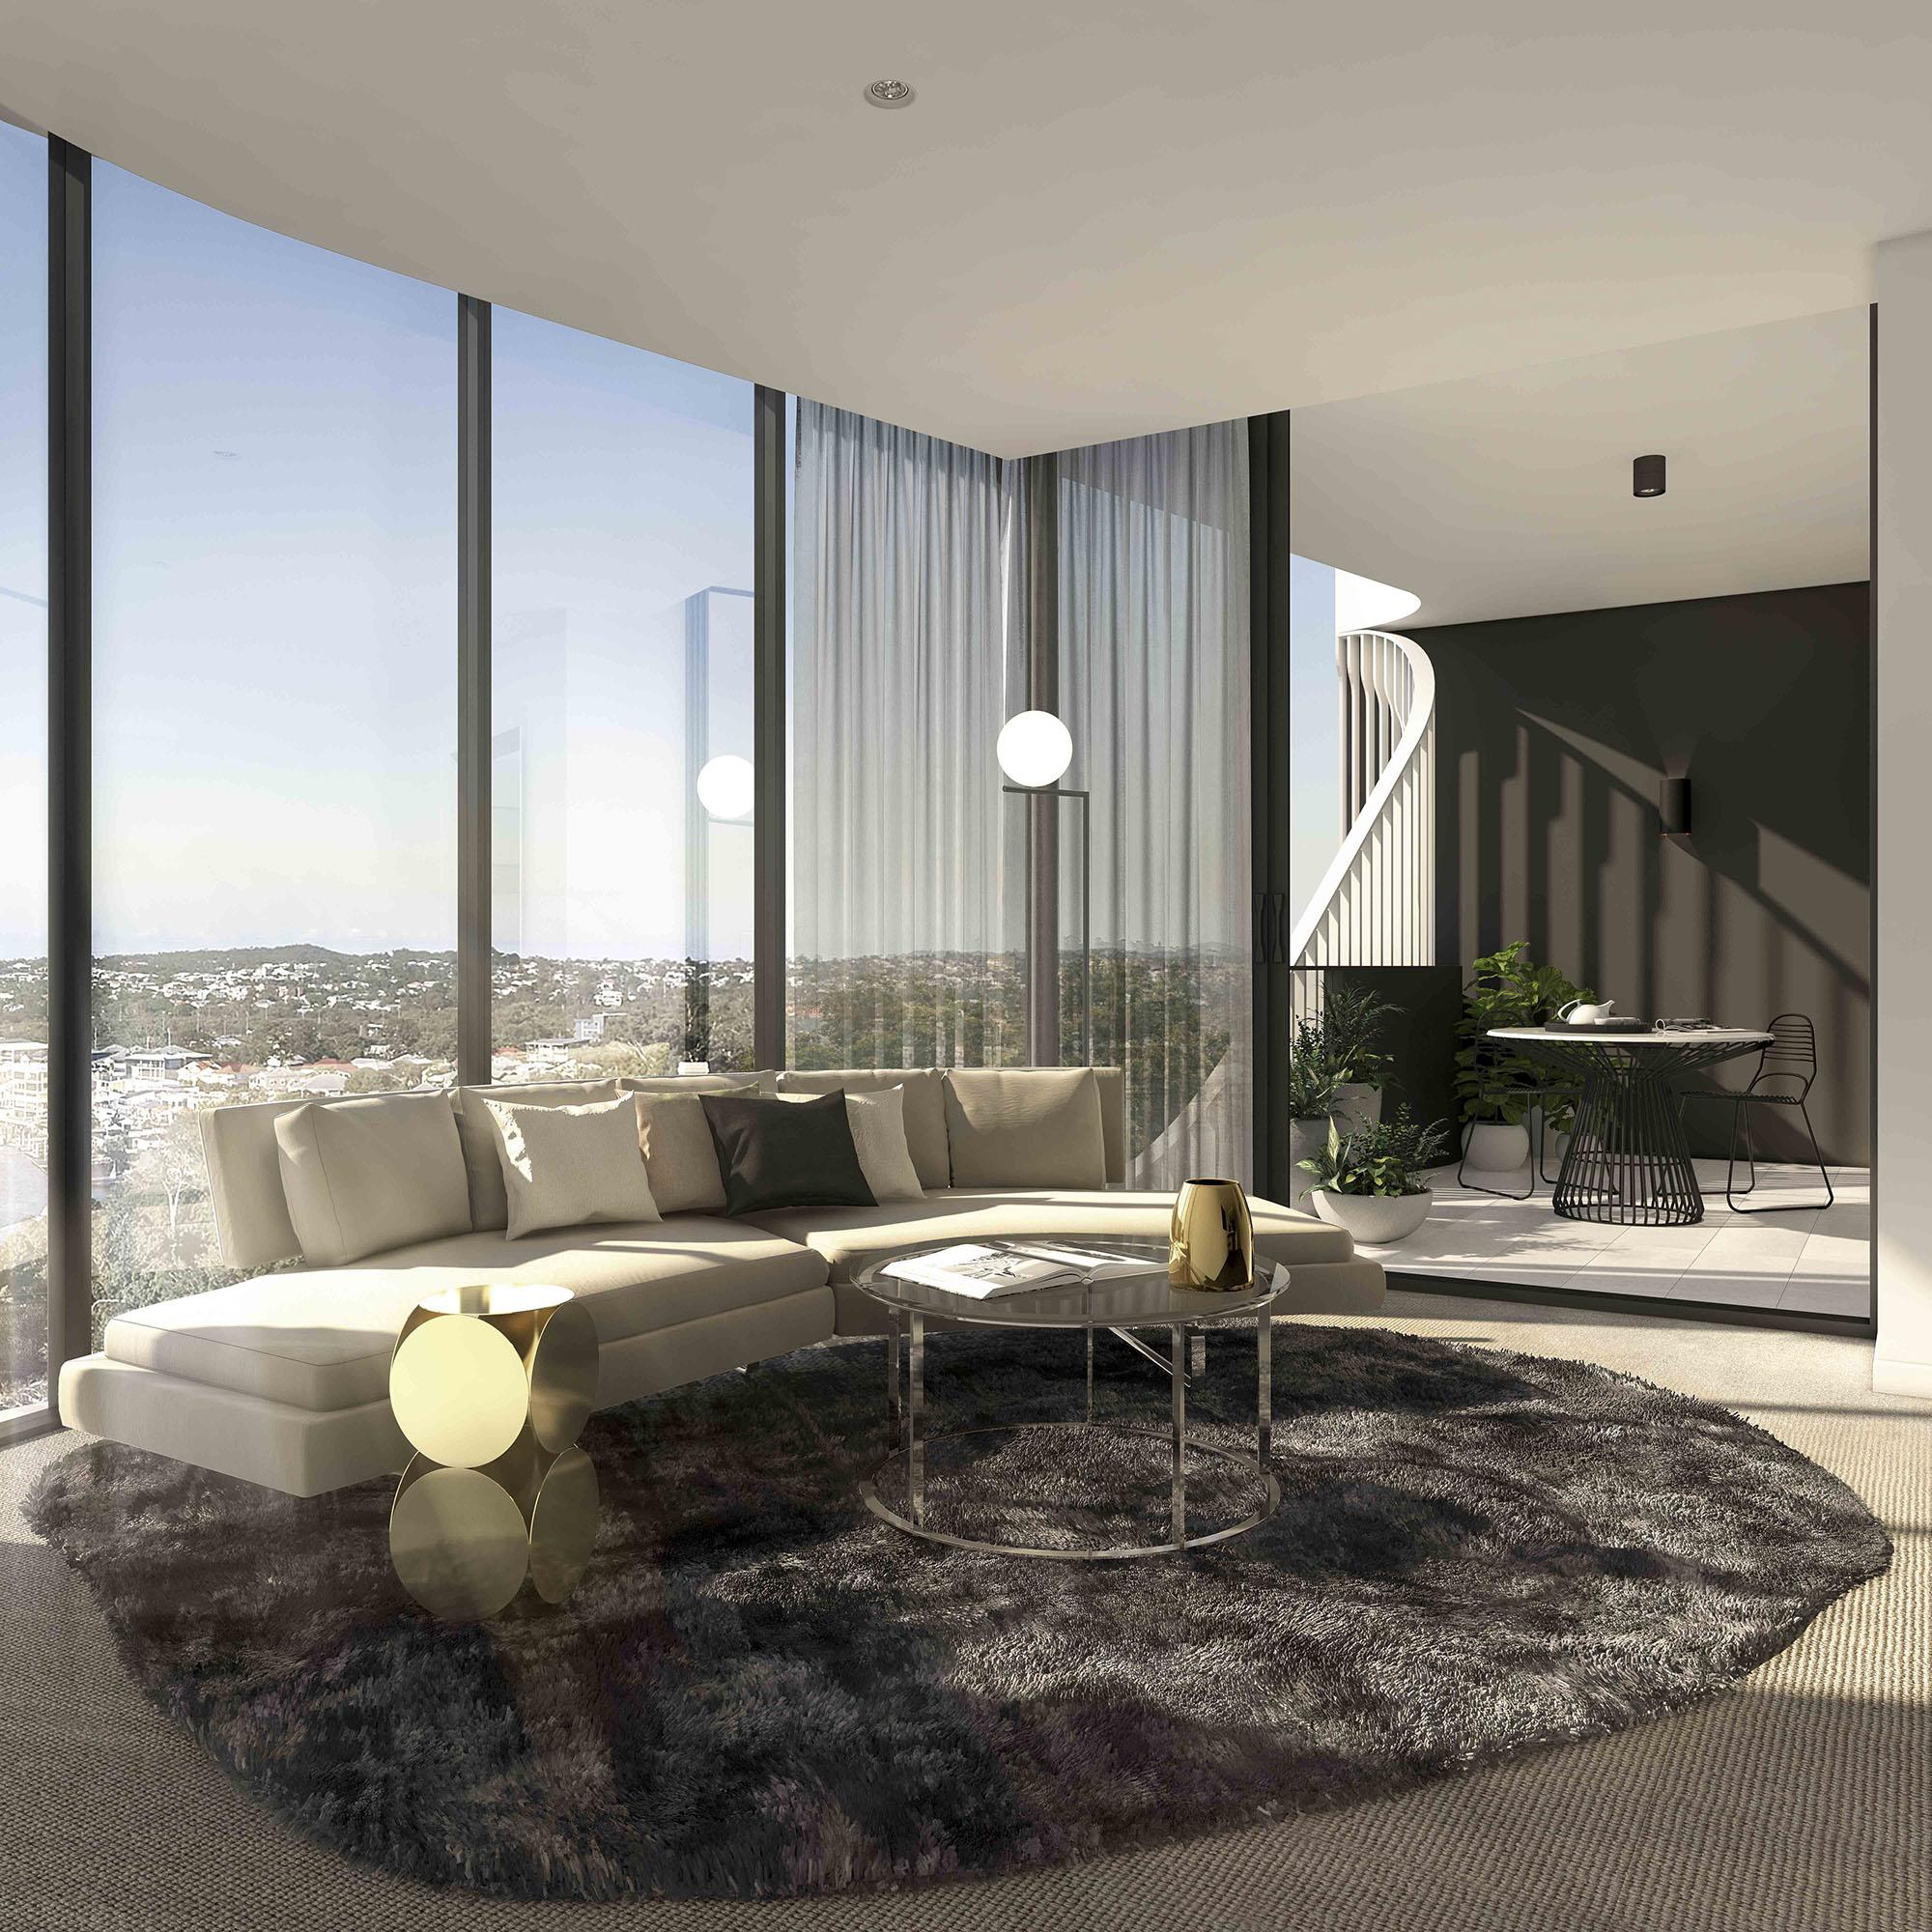 Rothelowman Architecture Brisbane, QLD Valencia